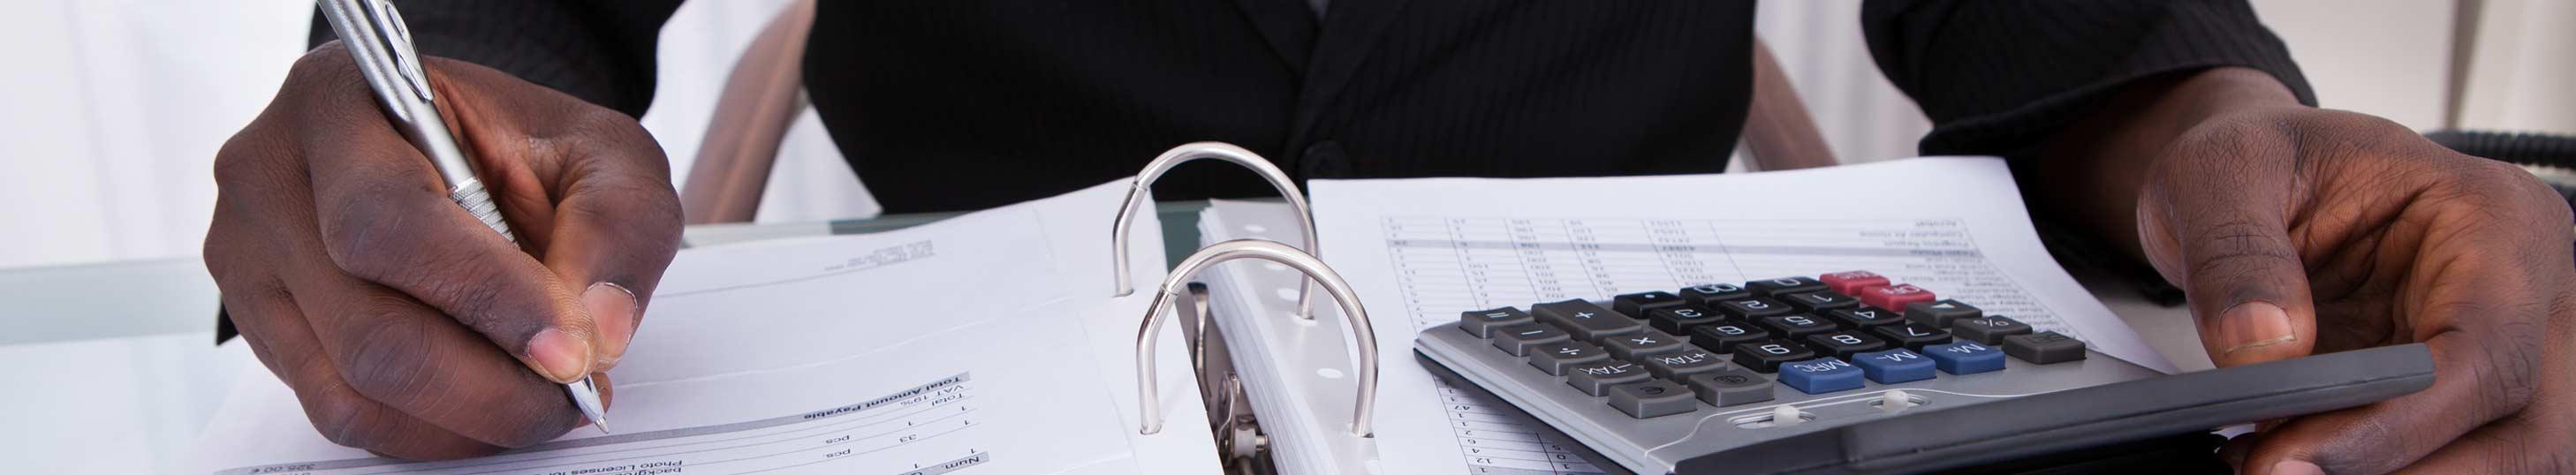 Mortgage Loan Calculator - Associated Credit Union of Texas